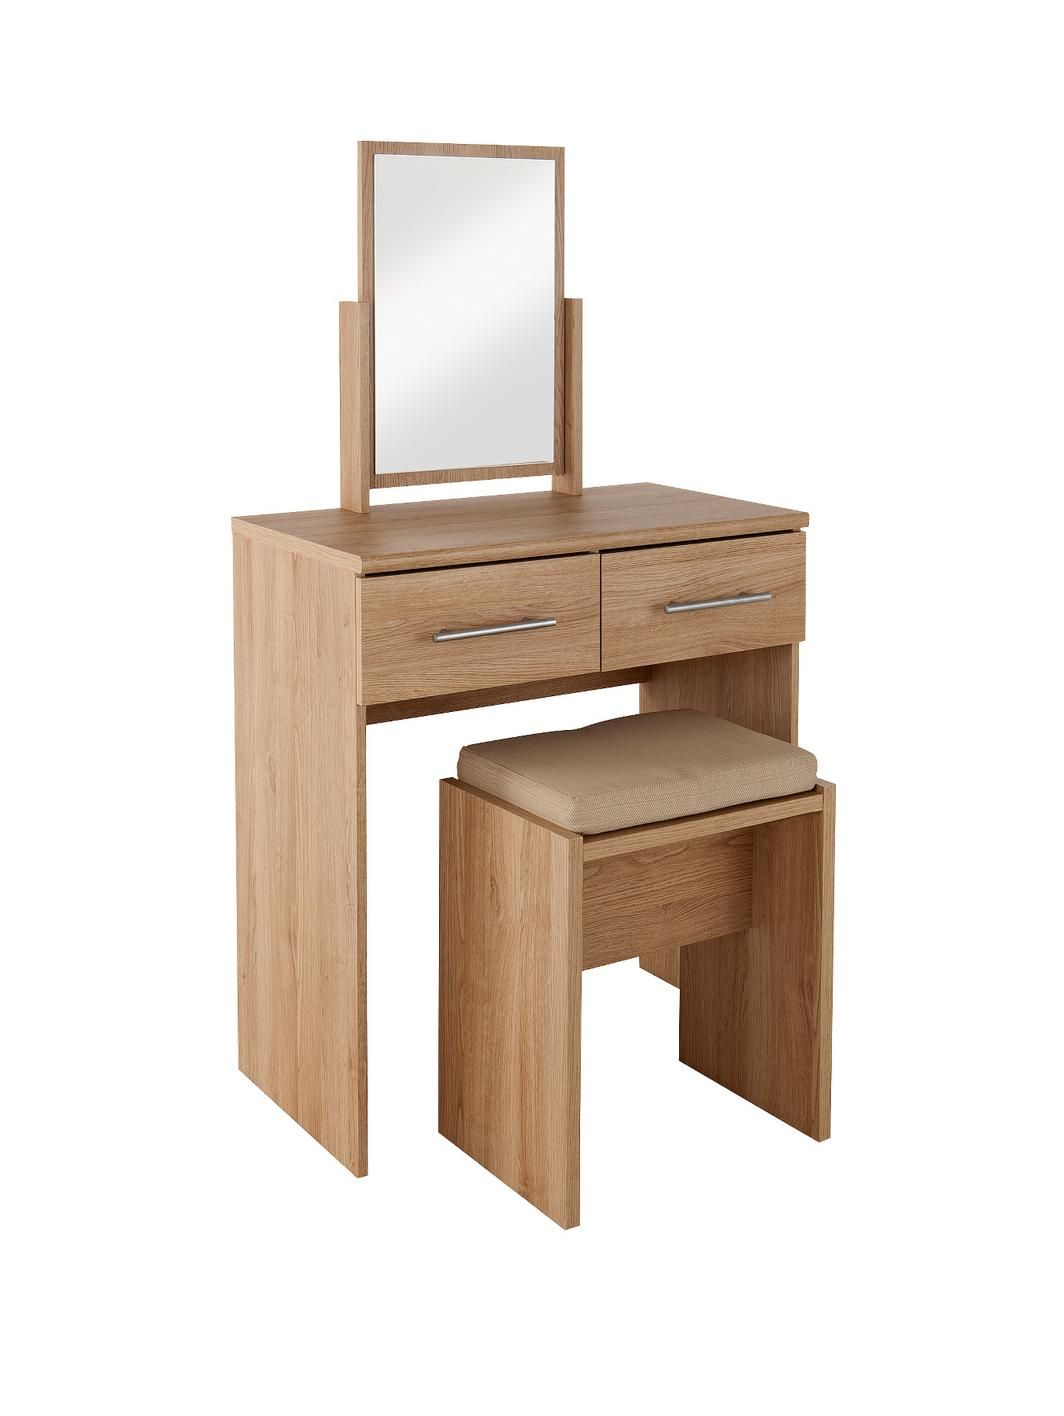 Prague Dressing Table Stool And Mirror Set - Prague bedroom furniture set